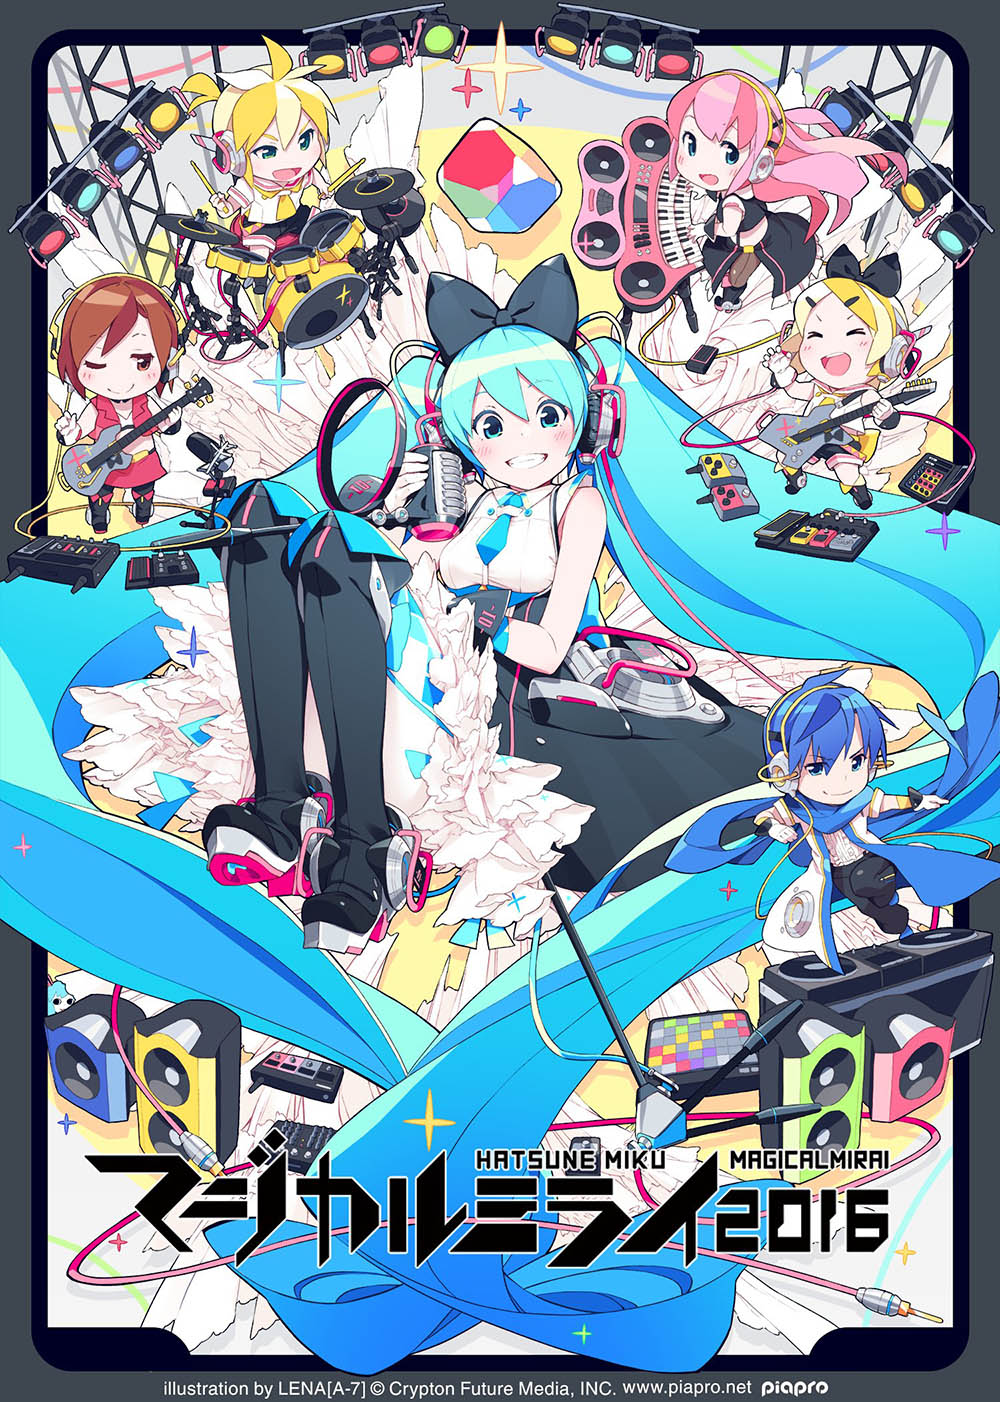 Hatsune Miku Magical Mirai 2016